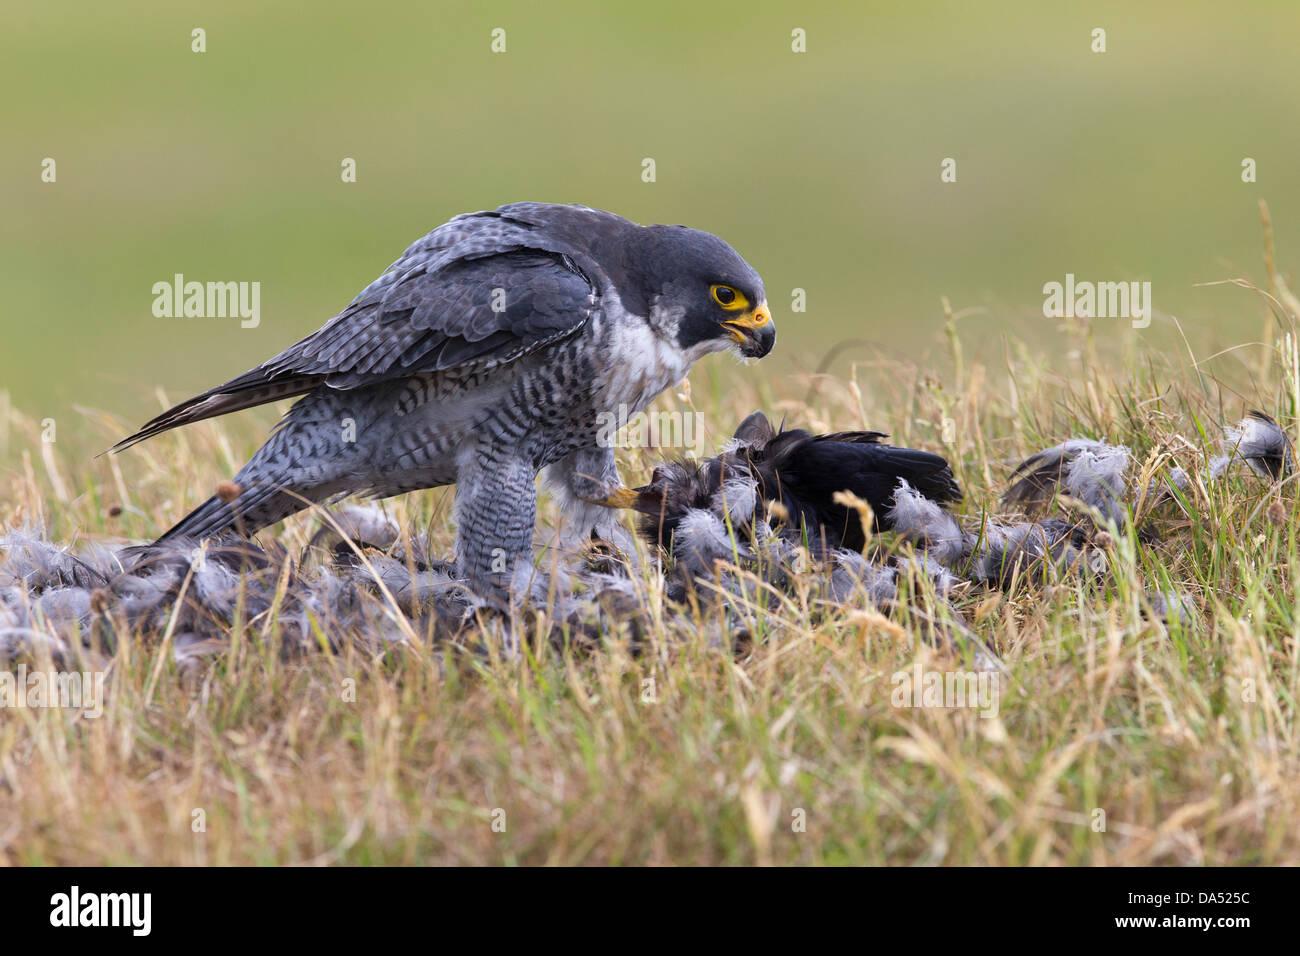 Peregrine Falcon with his prey - Stock Image